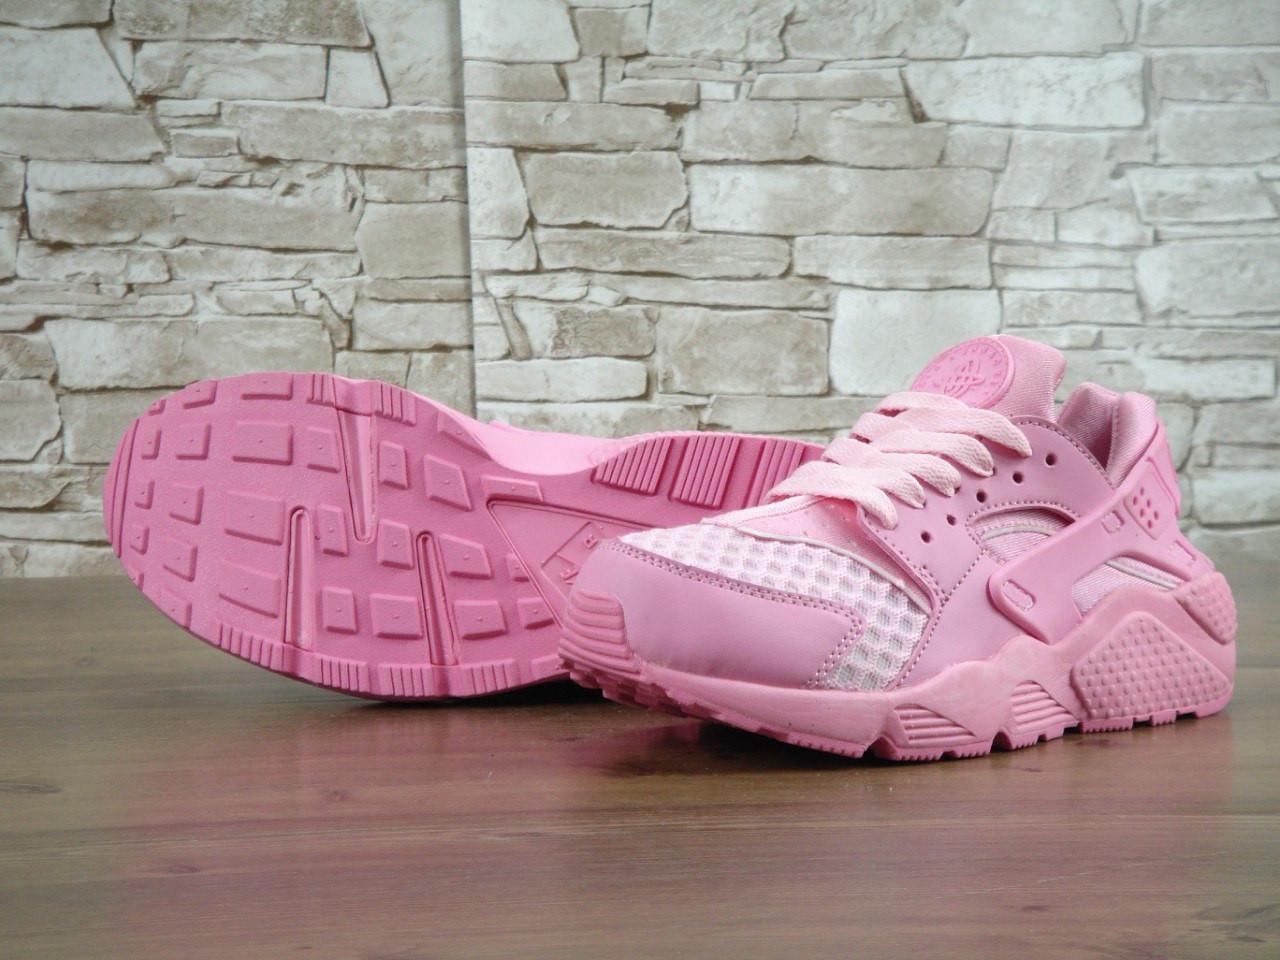 1ea946d8 Кроссовки Nike Huarache Aloha Pack розовые с сеткой (Реплика ААА+): ...